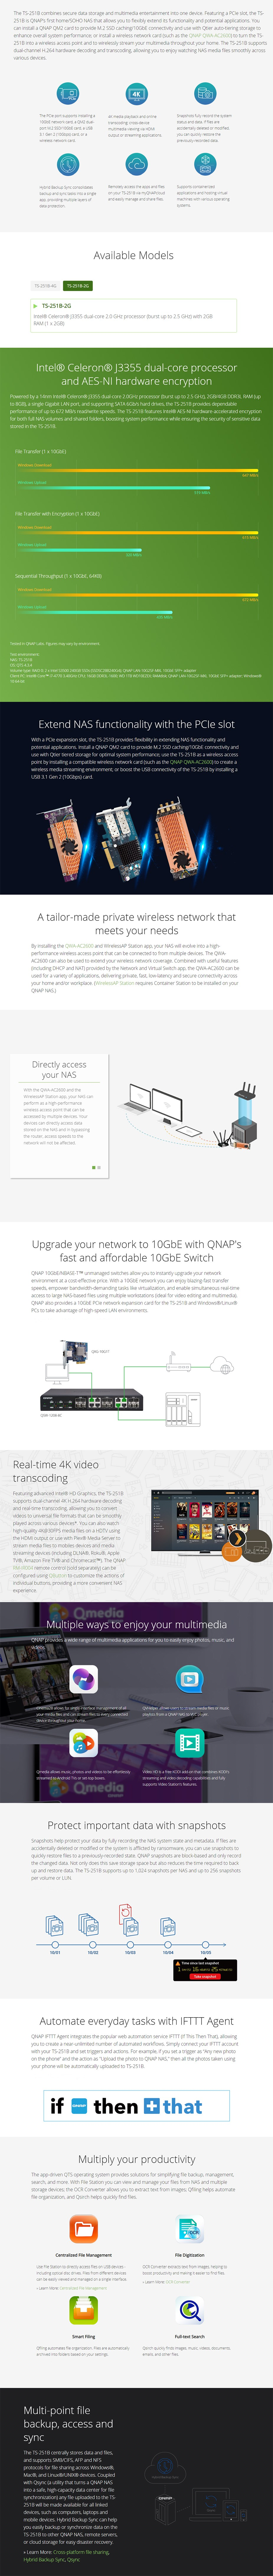 QNAP TS-251B-2G 2 Bay Diskless NAS Dual-Core 2.0 GHz 2GB RAM - Desktop Overview 2